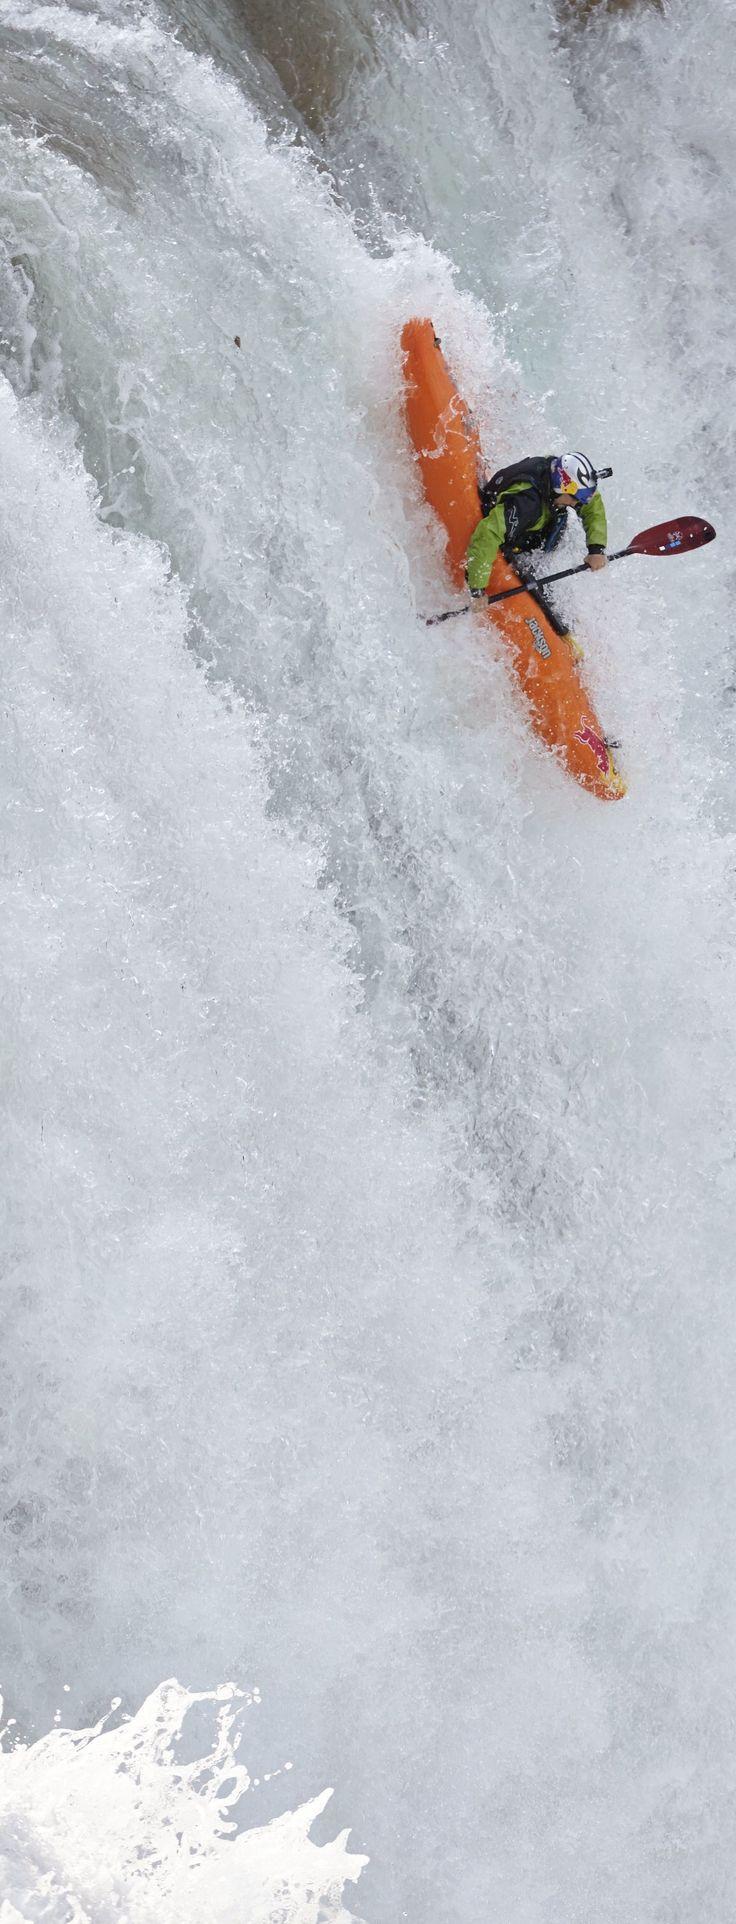 Chasing waterfalls http://win.gs/1by7LUt #kayak #adventure #waterfall Image: Alfredo Martinez/Red Bull Content Pool